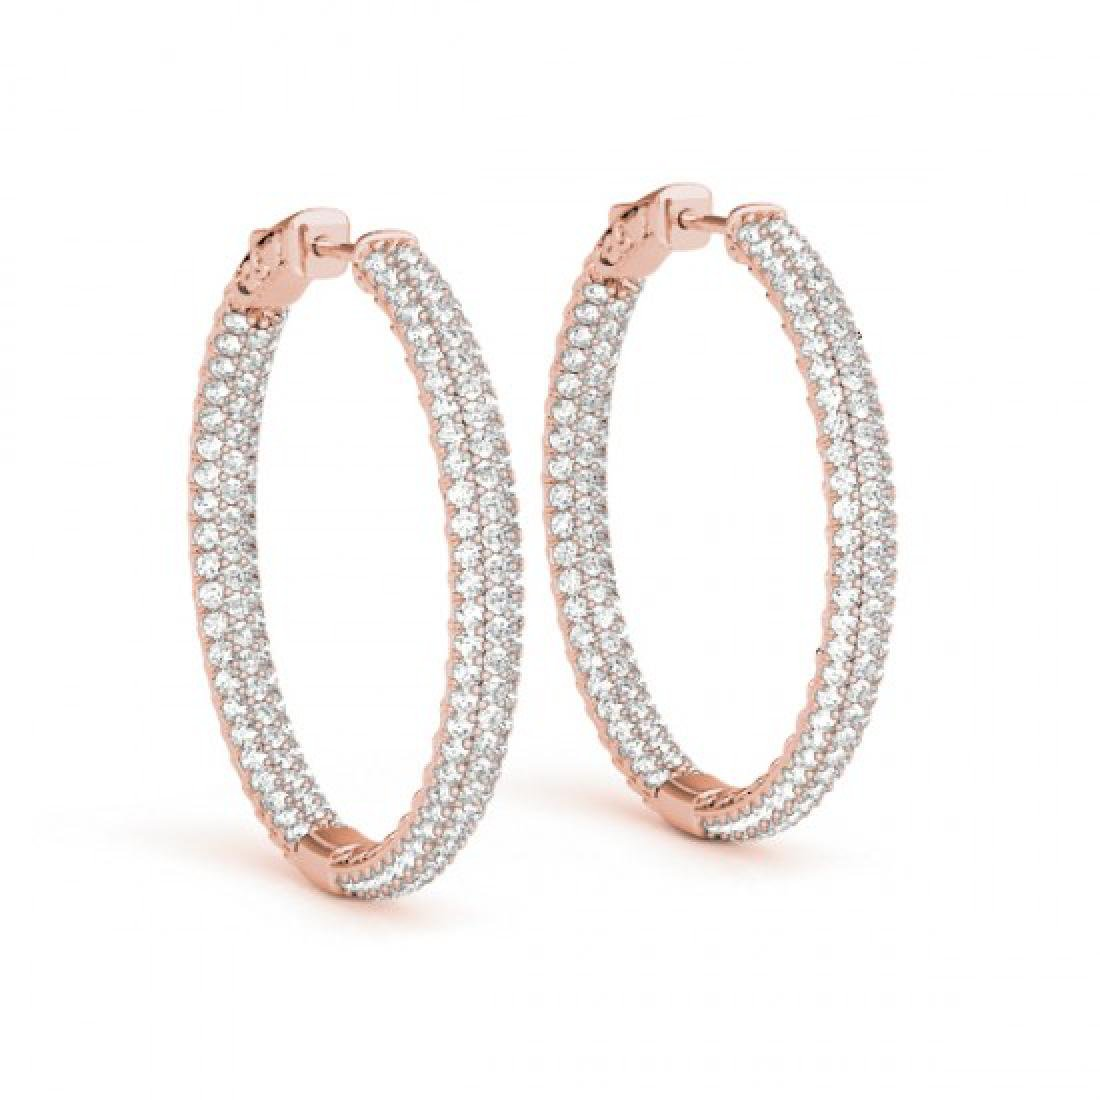 4.5 CTW Diamond VS/SI Certified 28 Mm Hoop Earrings 14K - 2